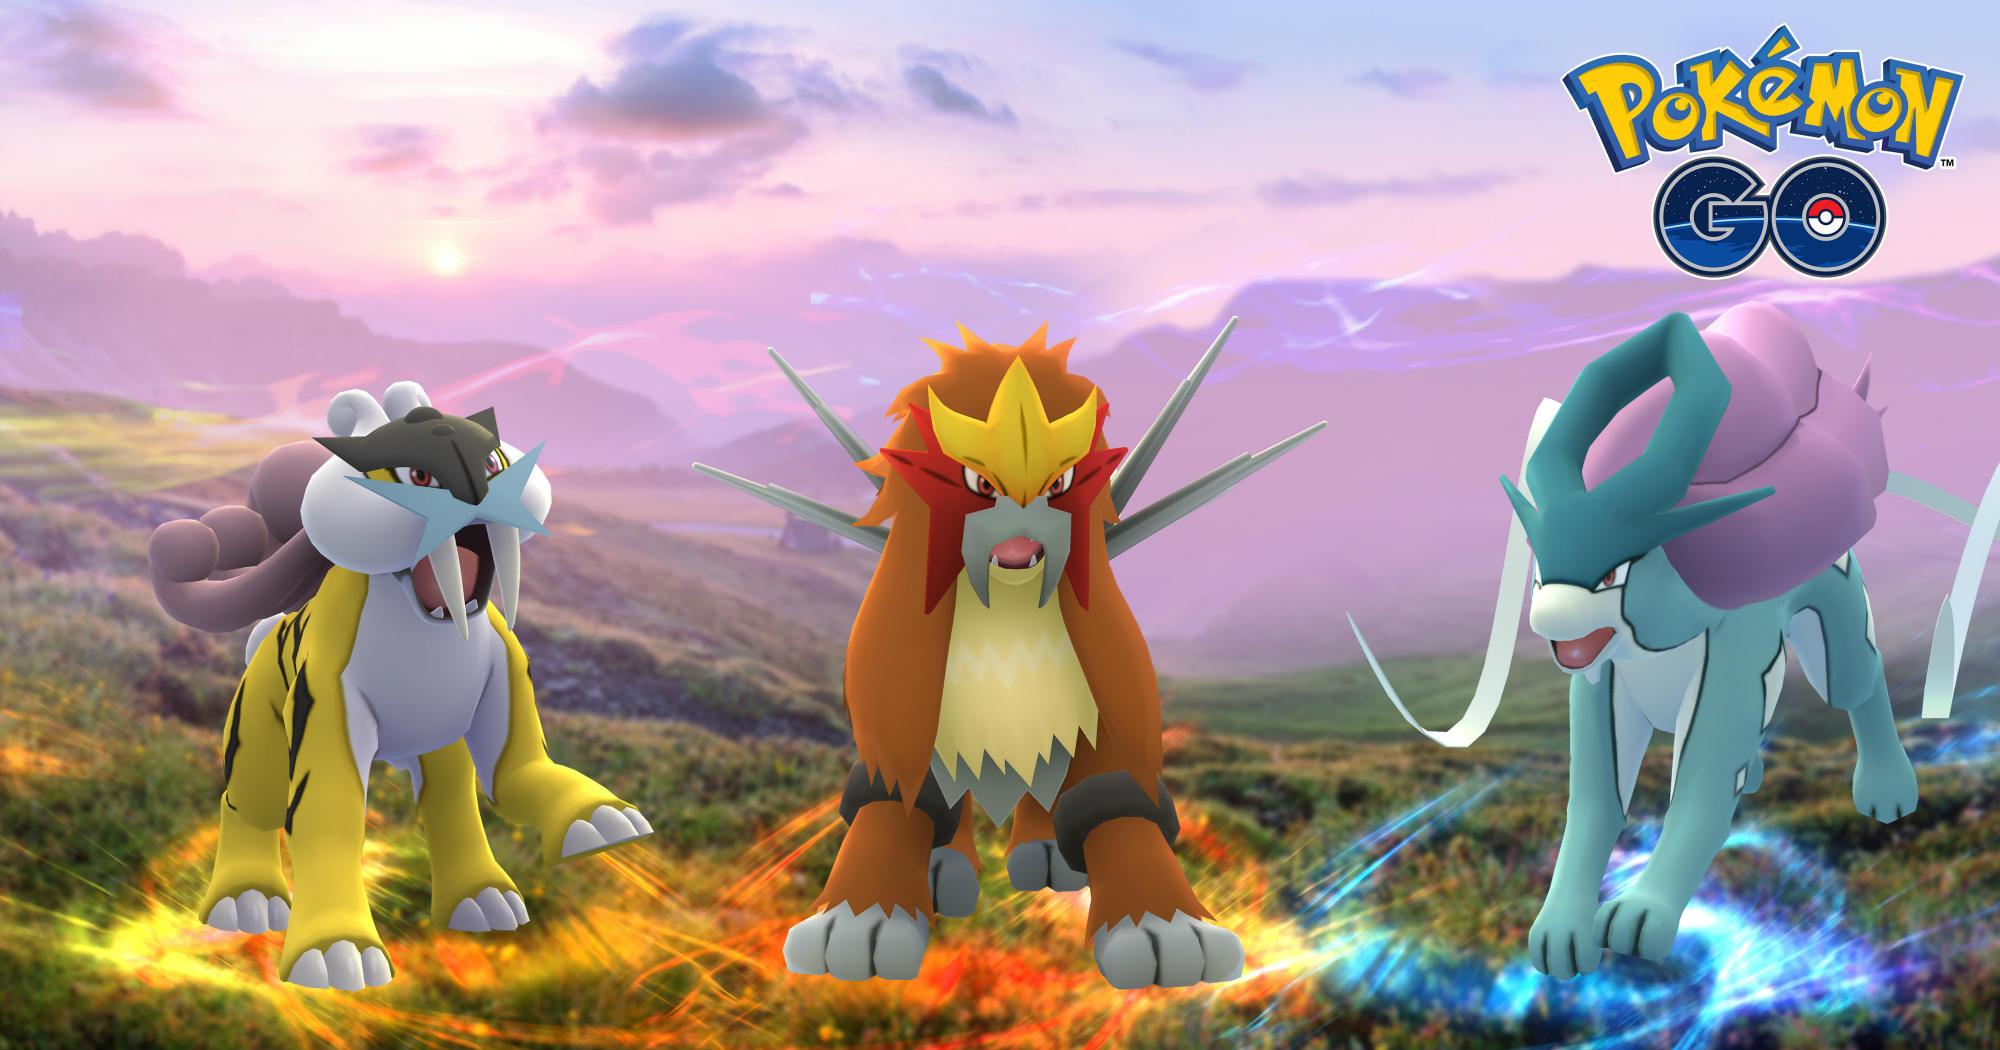 Pokémon Go Cómo Capturar A Entei Suicune Y Raikou Guías Y Trucos En Hobbyconsolas Juegos